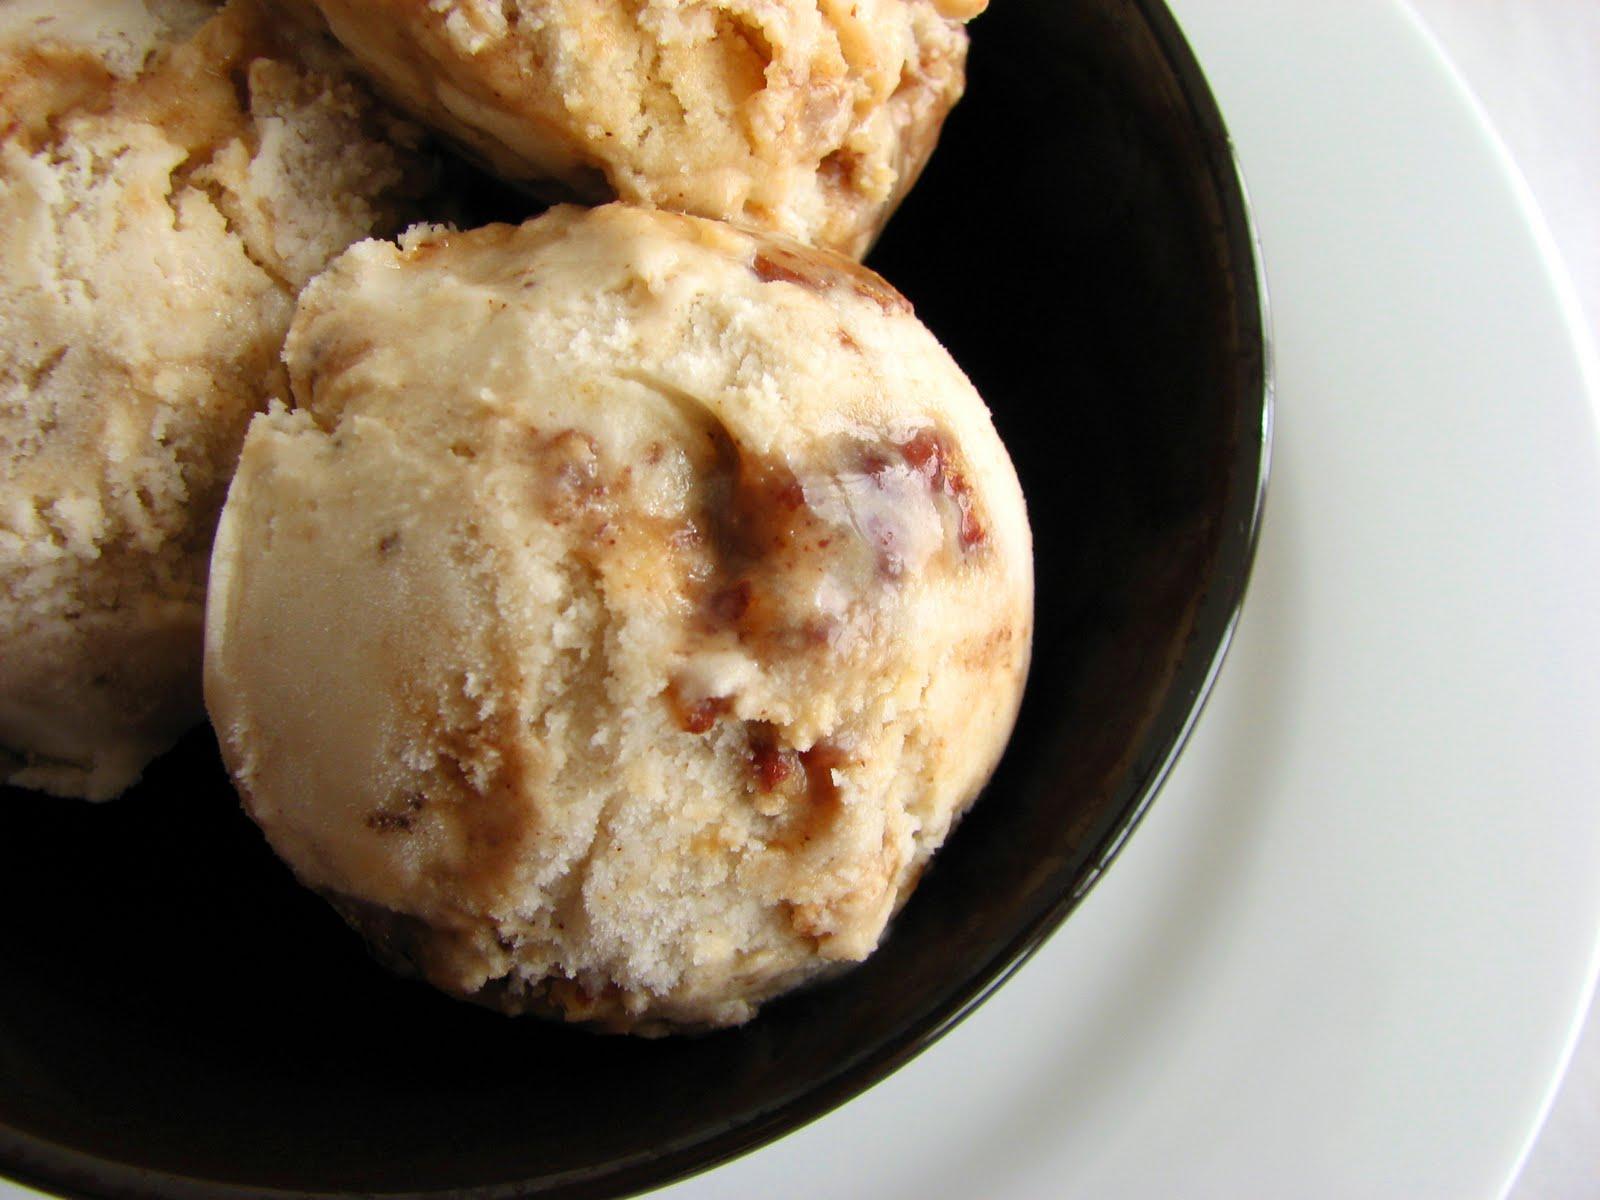 :pastry studio: Banana Caramel Pecan Ice Cream